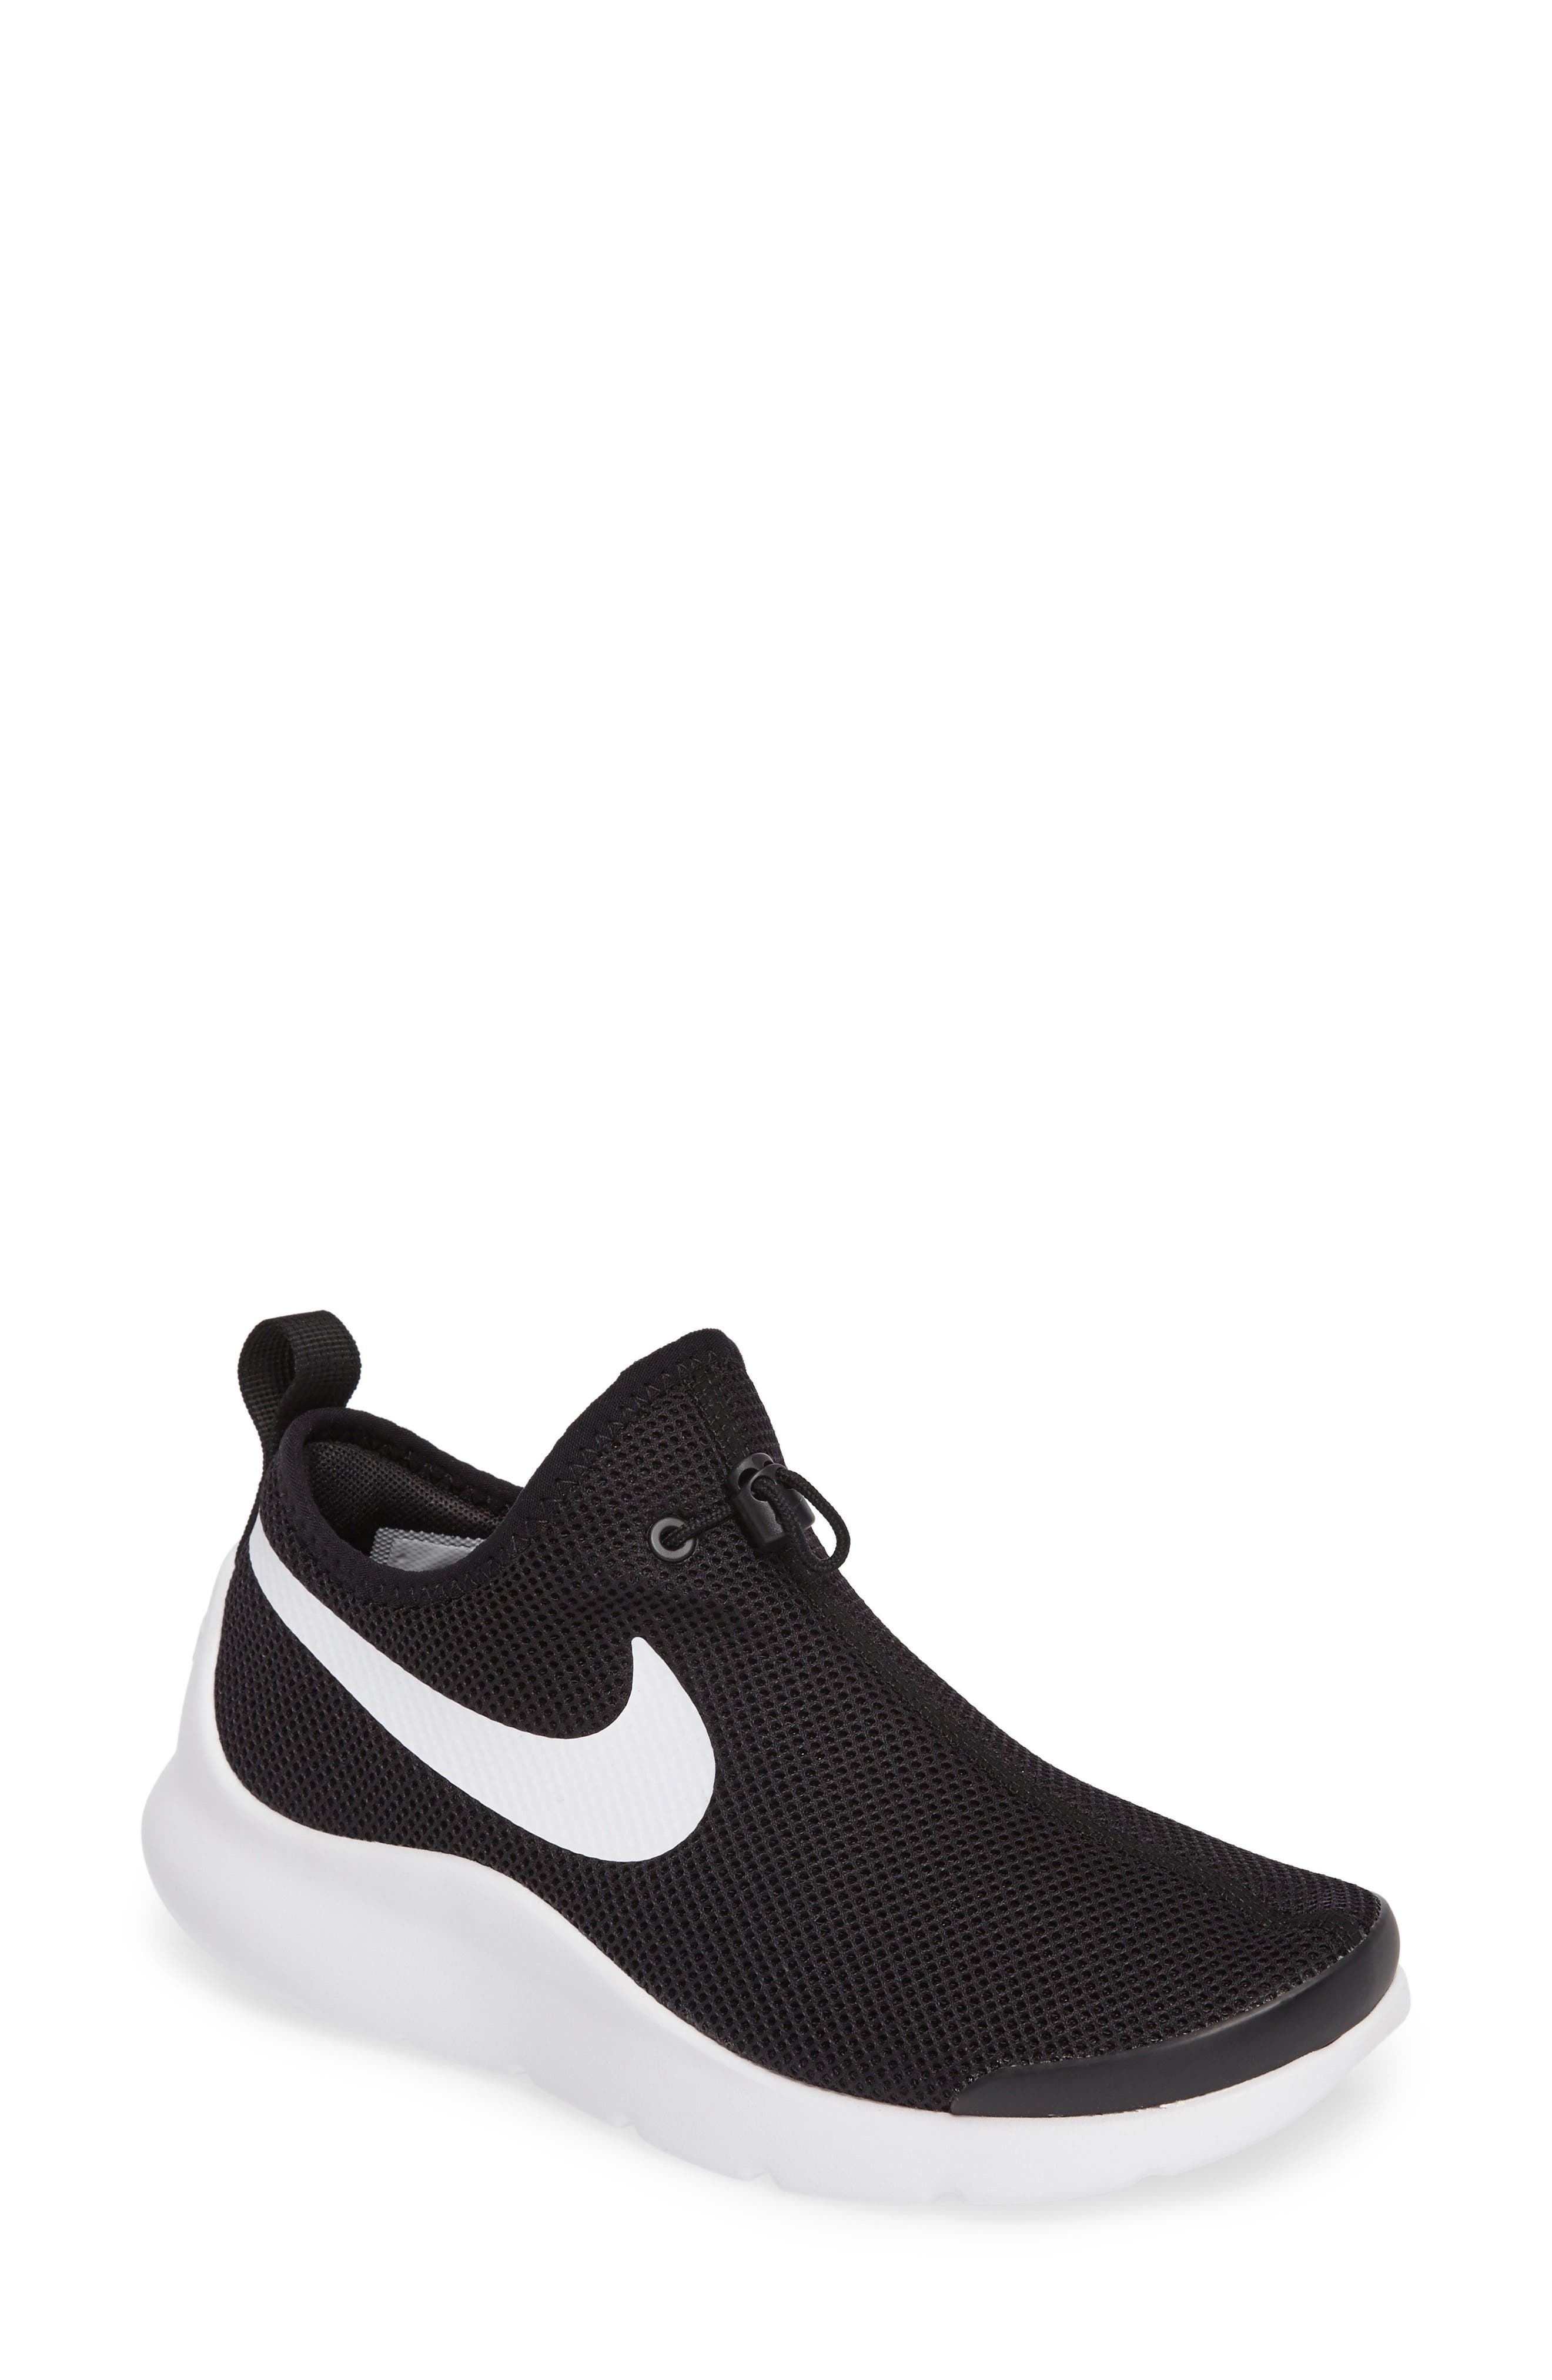 Aptare Slip-On Mesh Sneaker,                             Main thumbnail 1, color,                             002